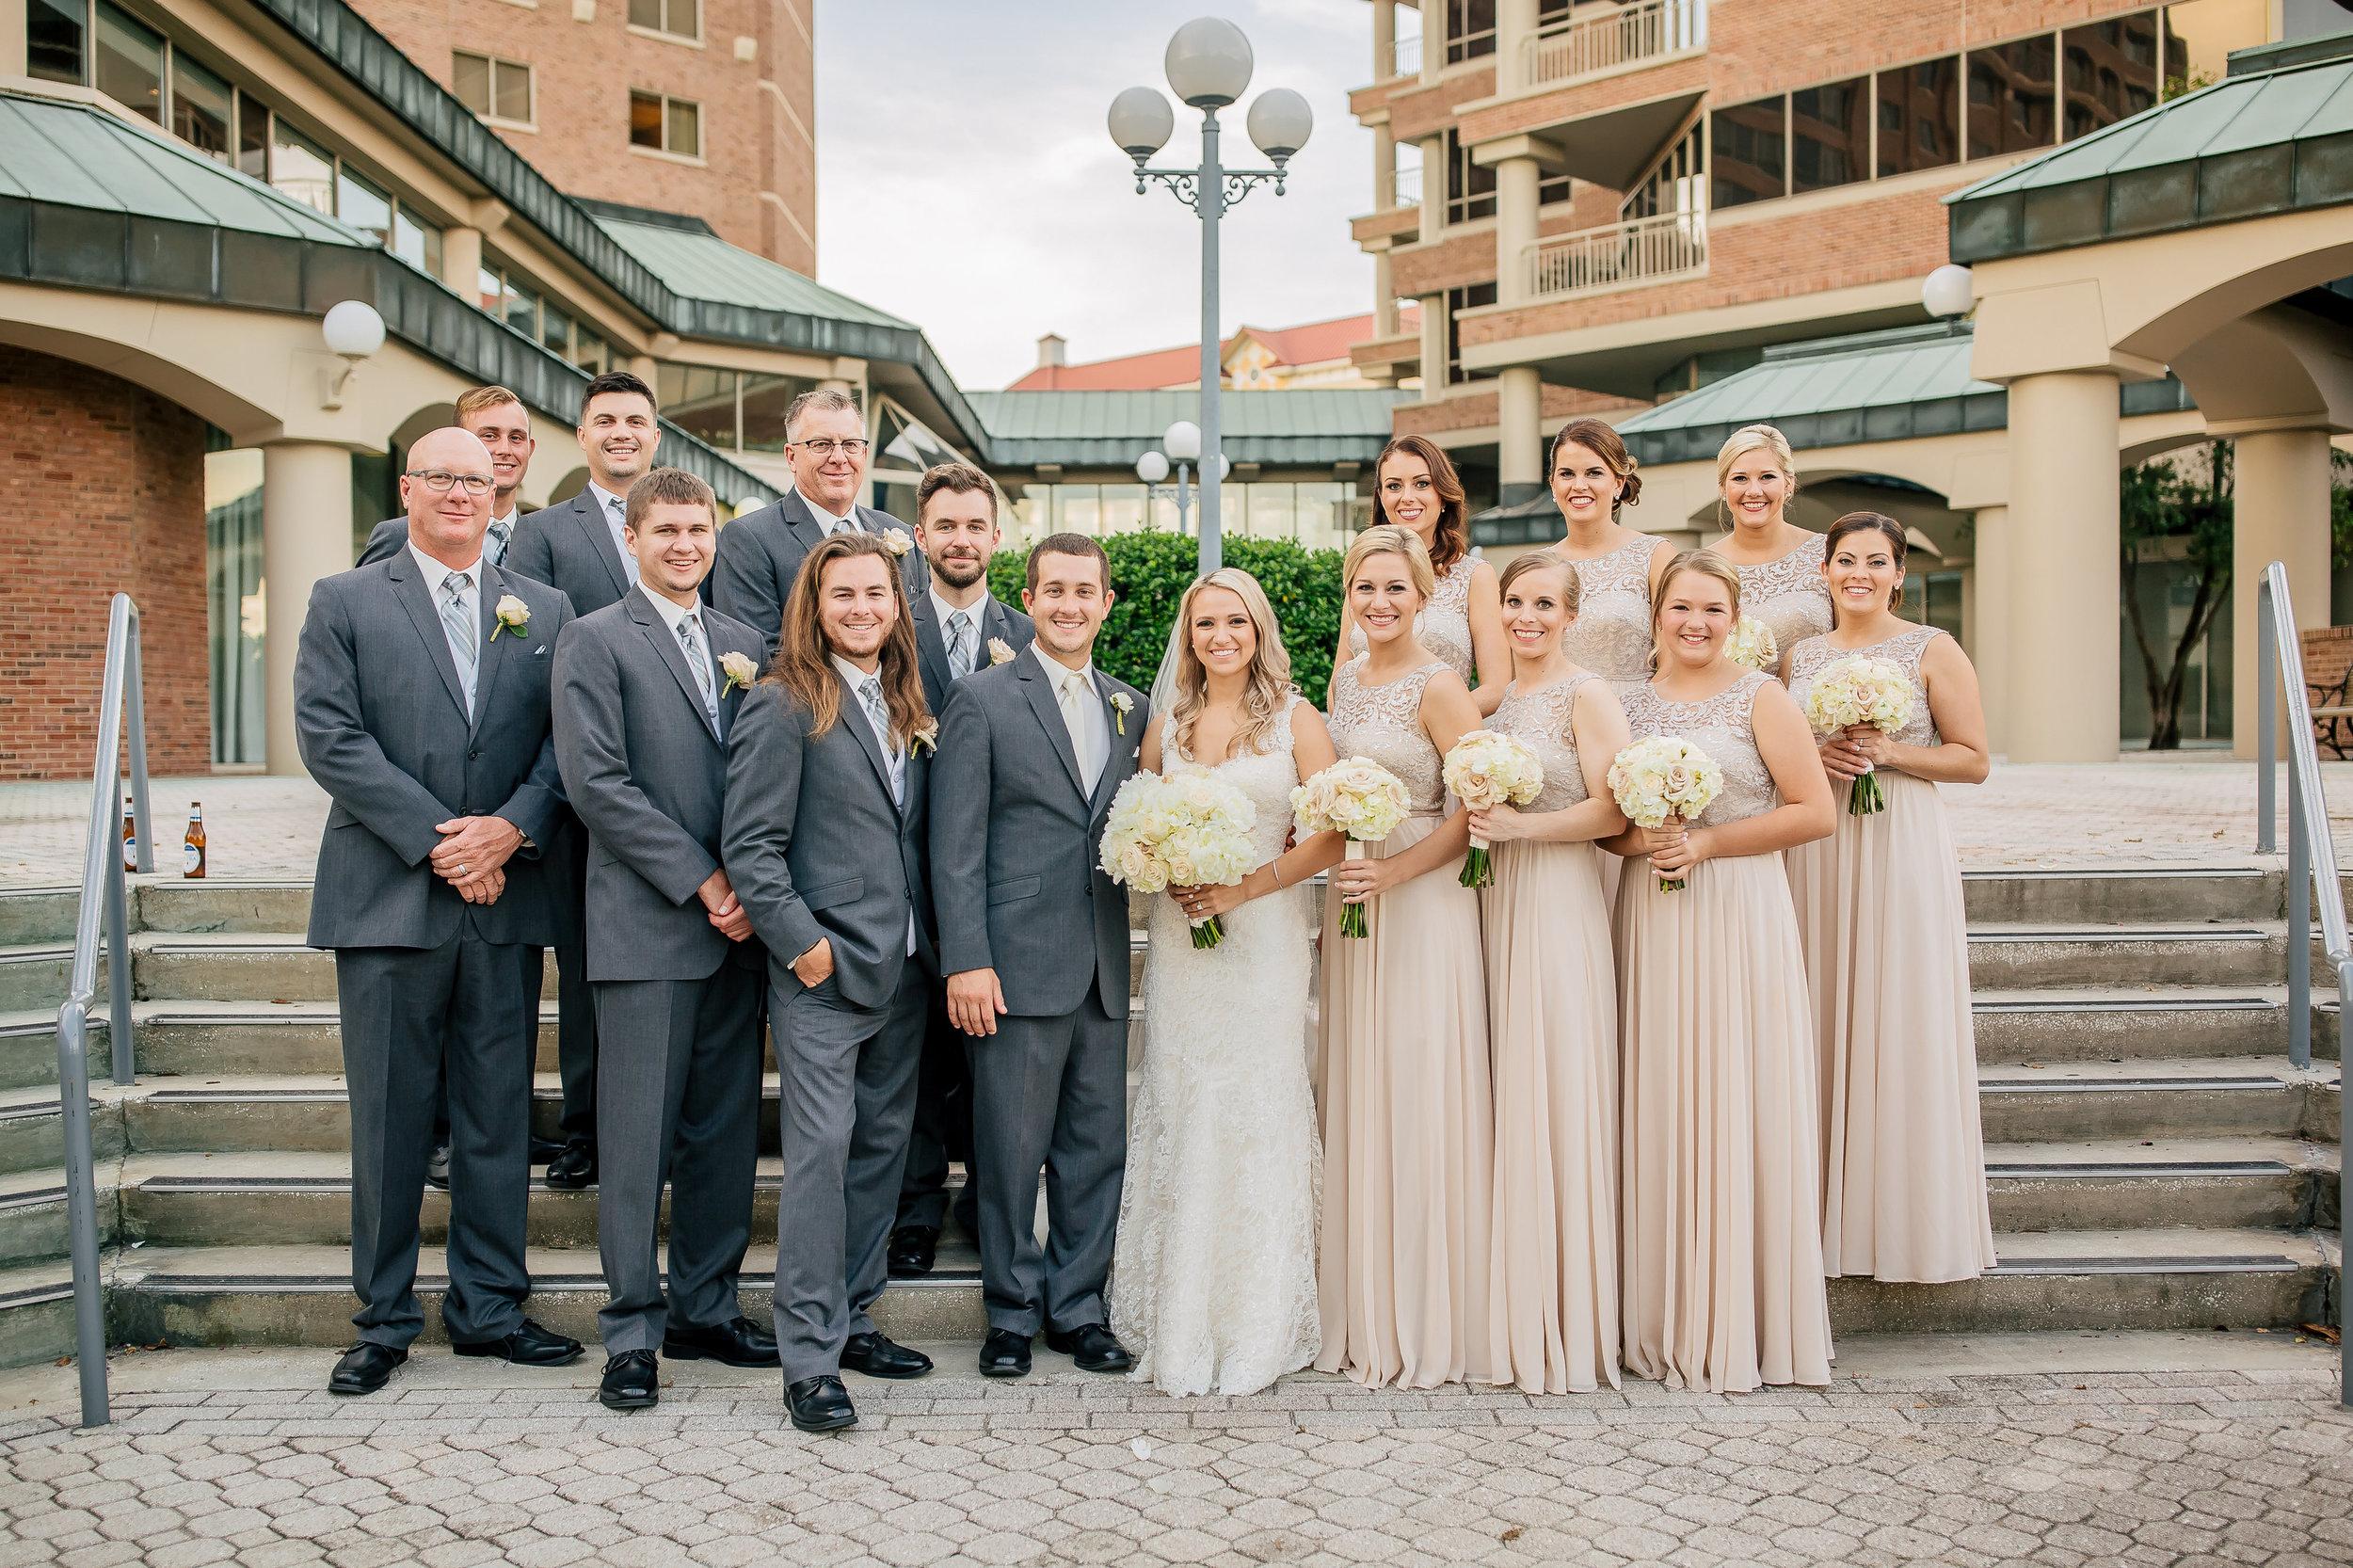 Roberts Wedding-Roberts Wedding 2016 JPEG-0366.jpeg